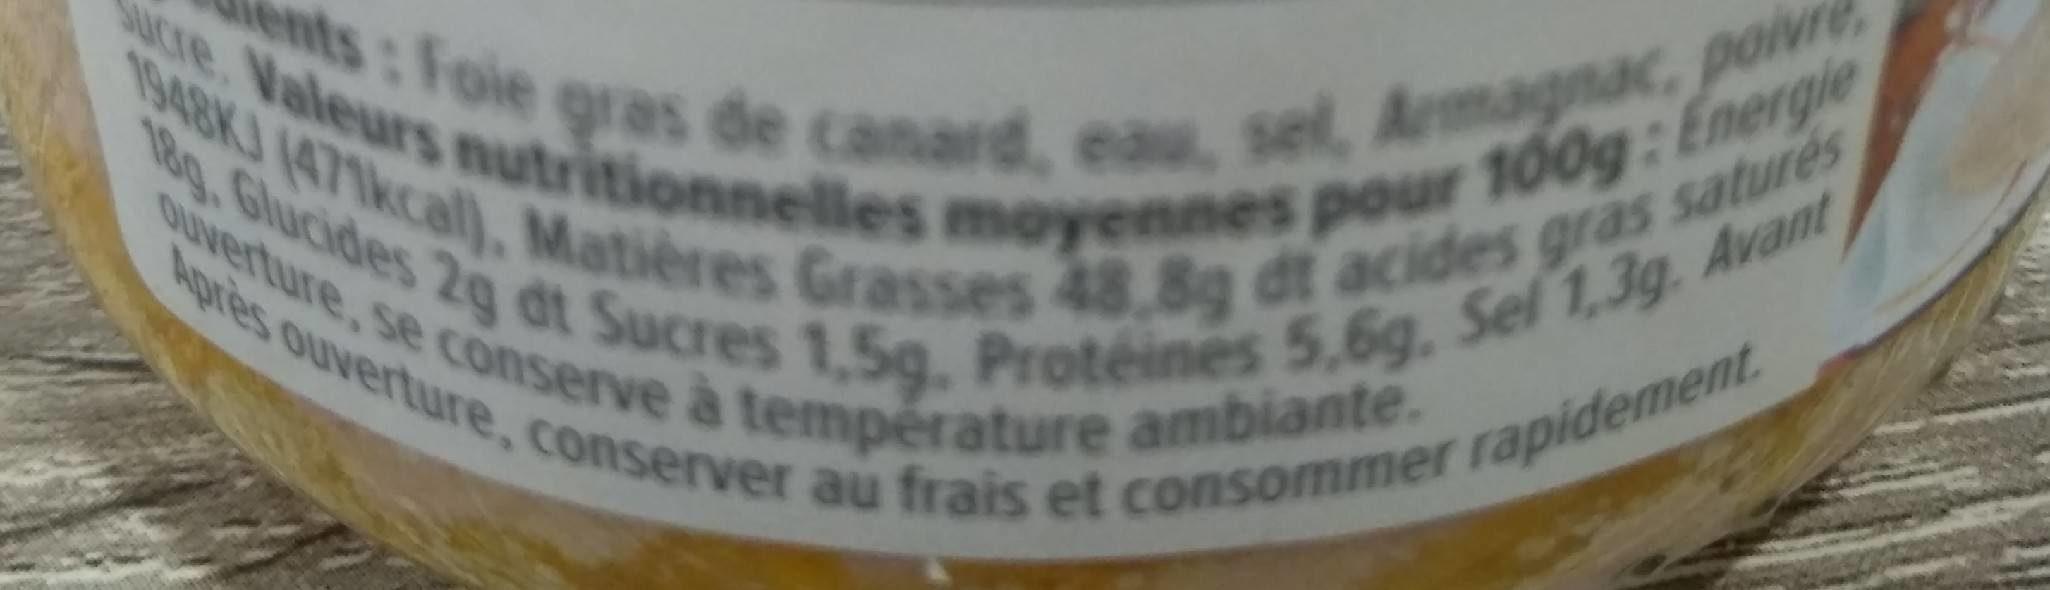 Bloc de foie gras de canard du sud-est - Ingrediënten - fr